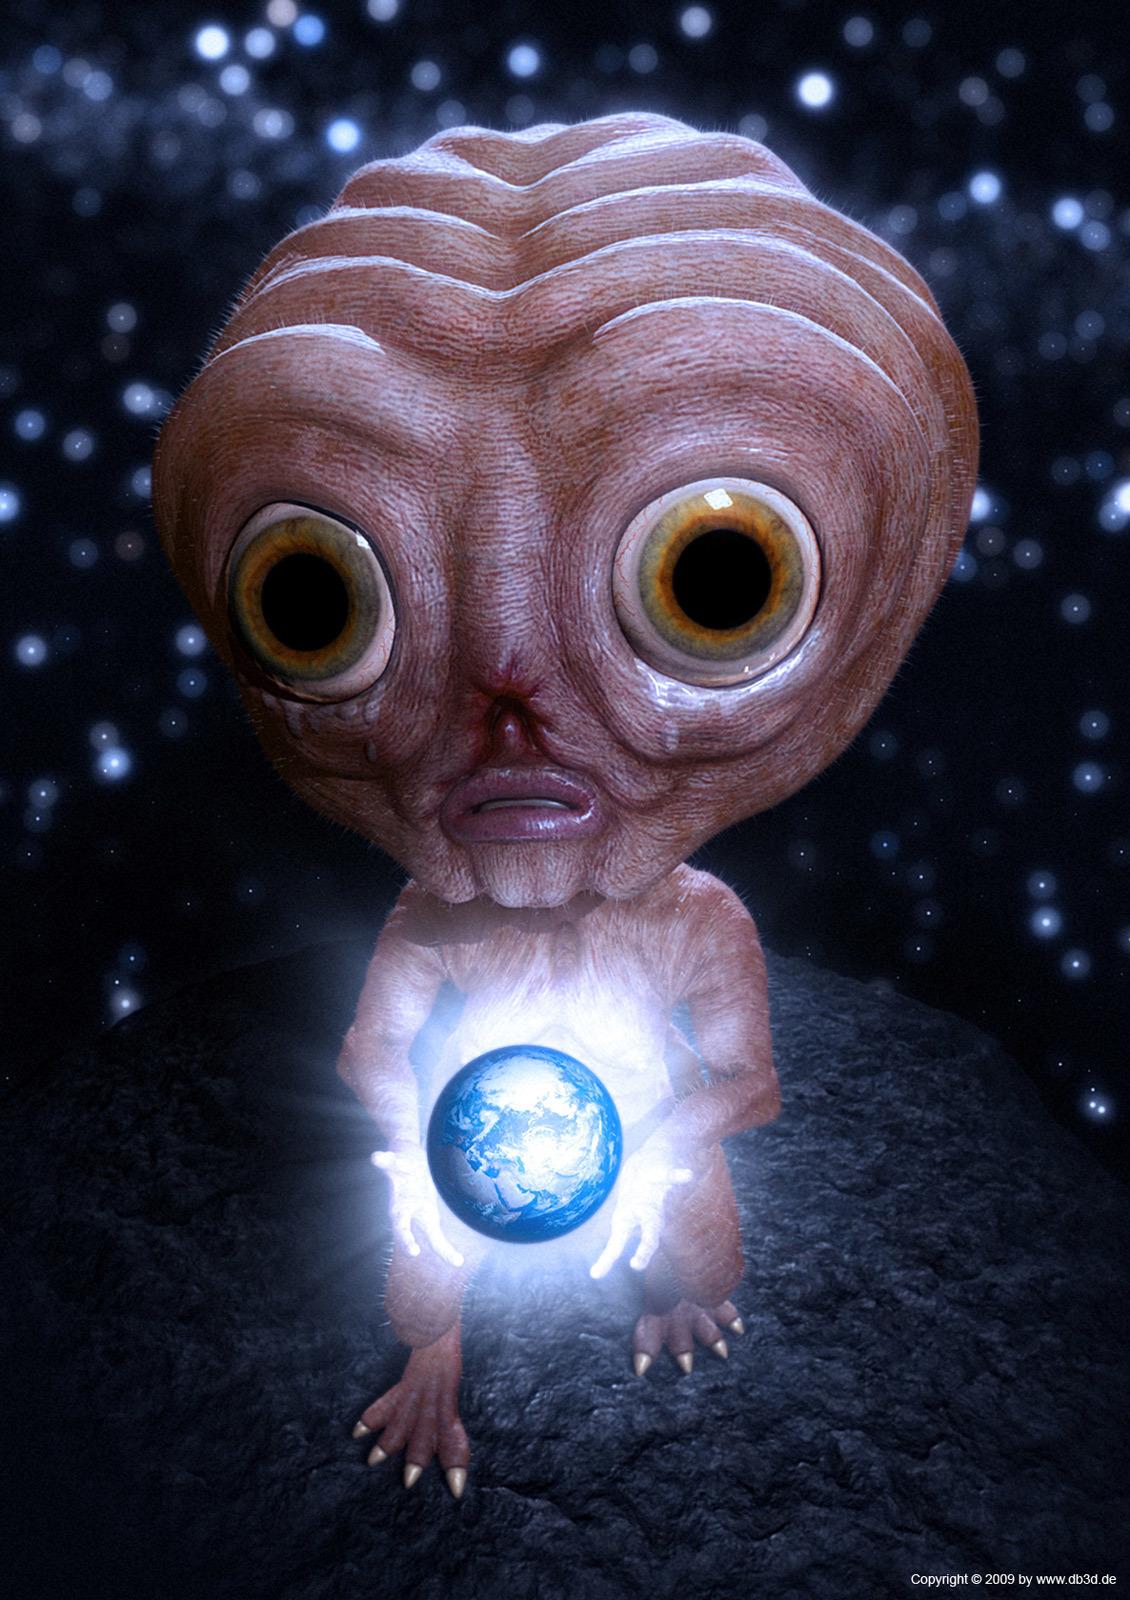 Freebug aliens world 1 438ee906 i0c8